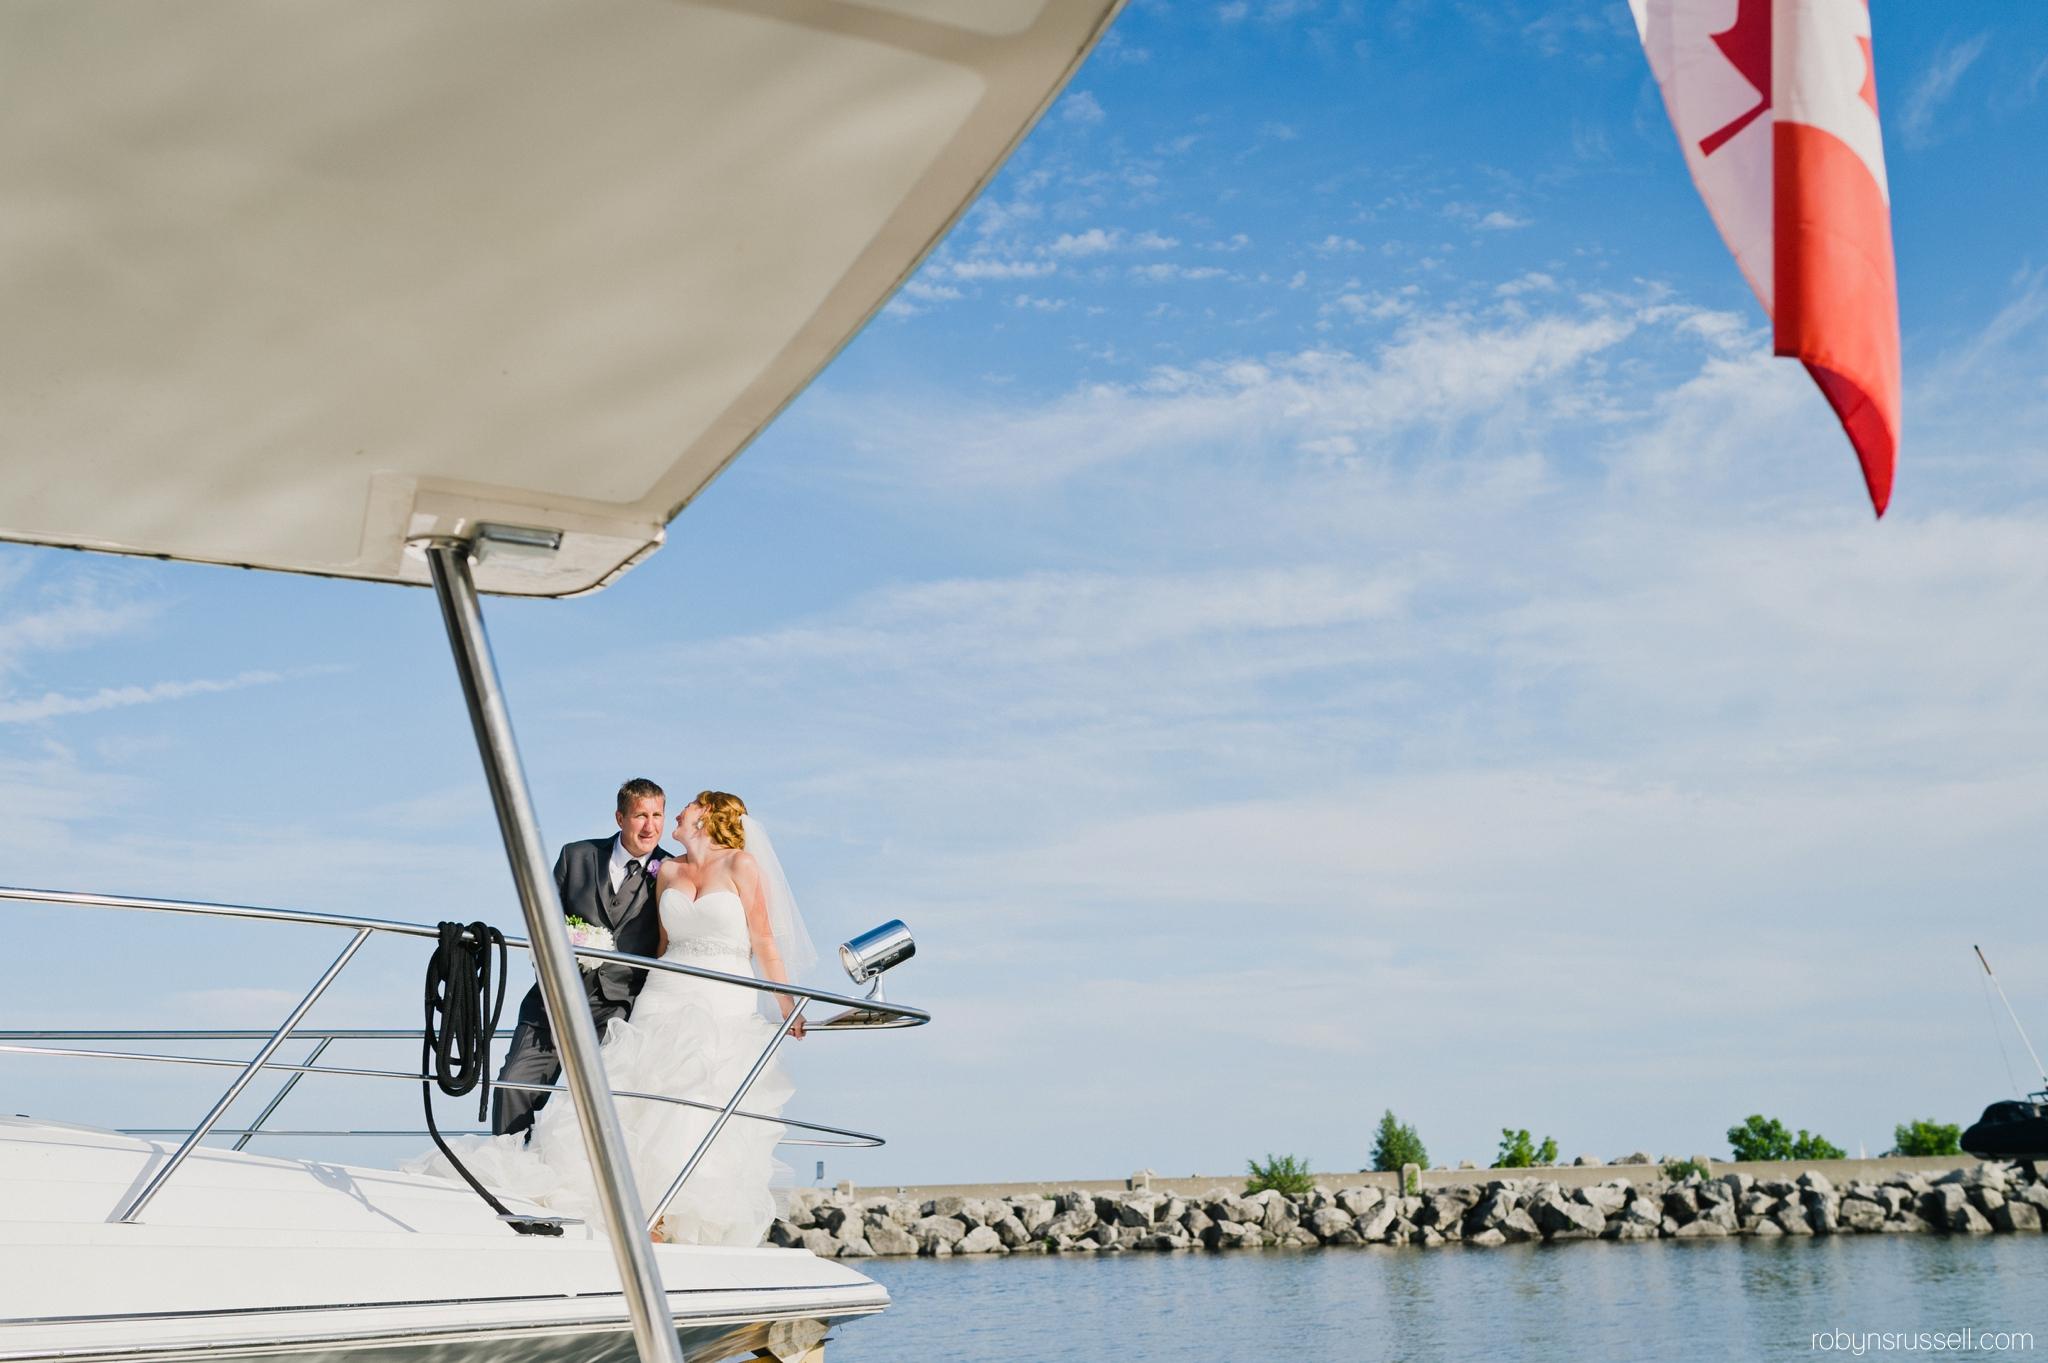 24-bride-and-groom-on-private-boat-bronte-marina-oakville.jpg